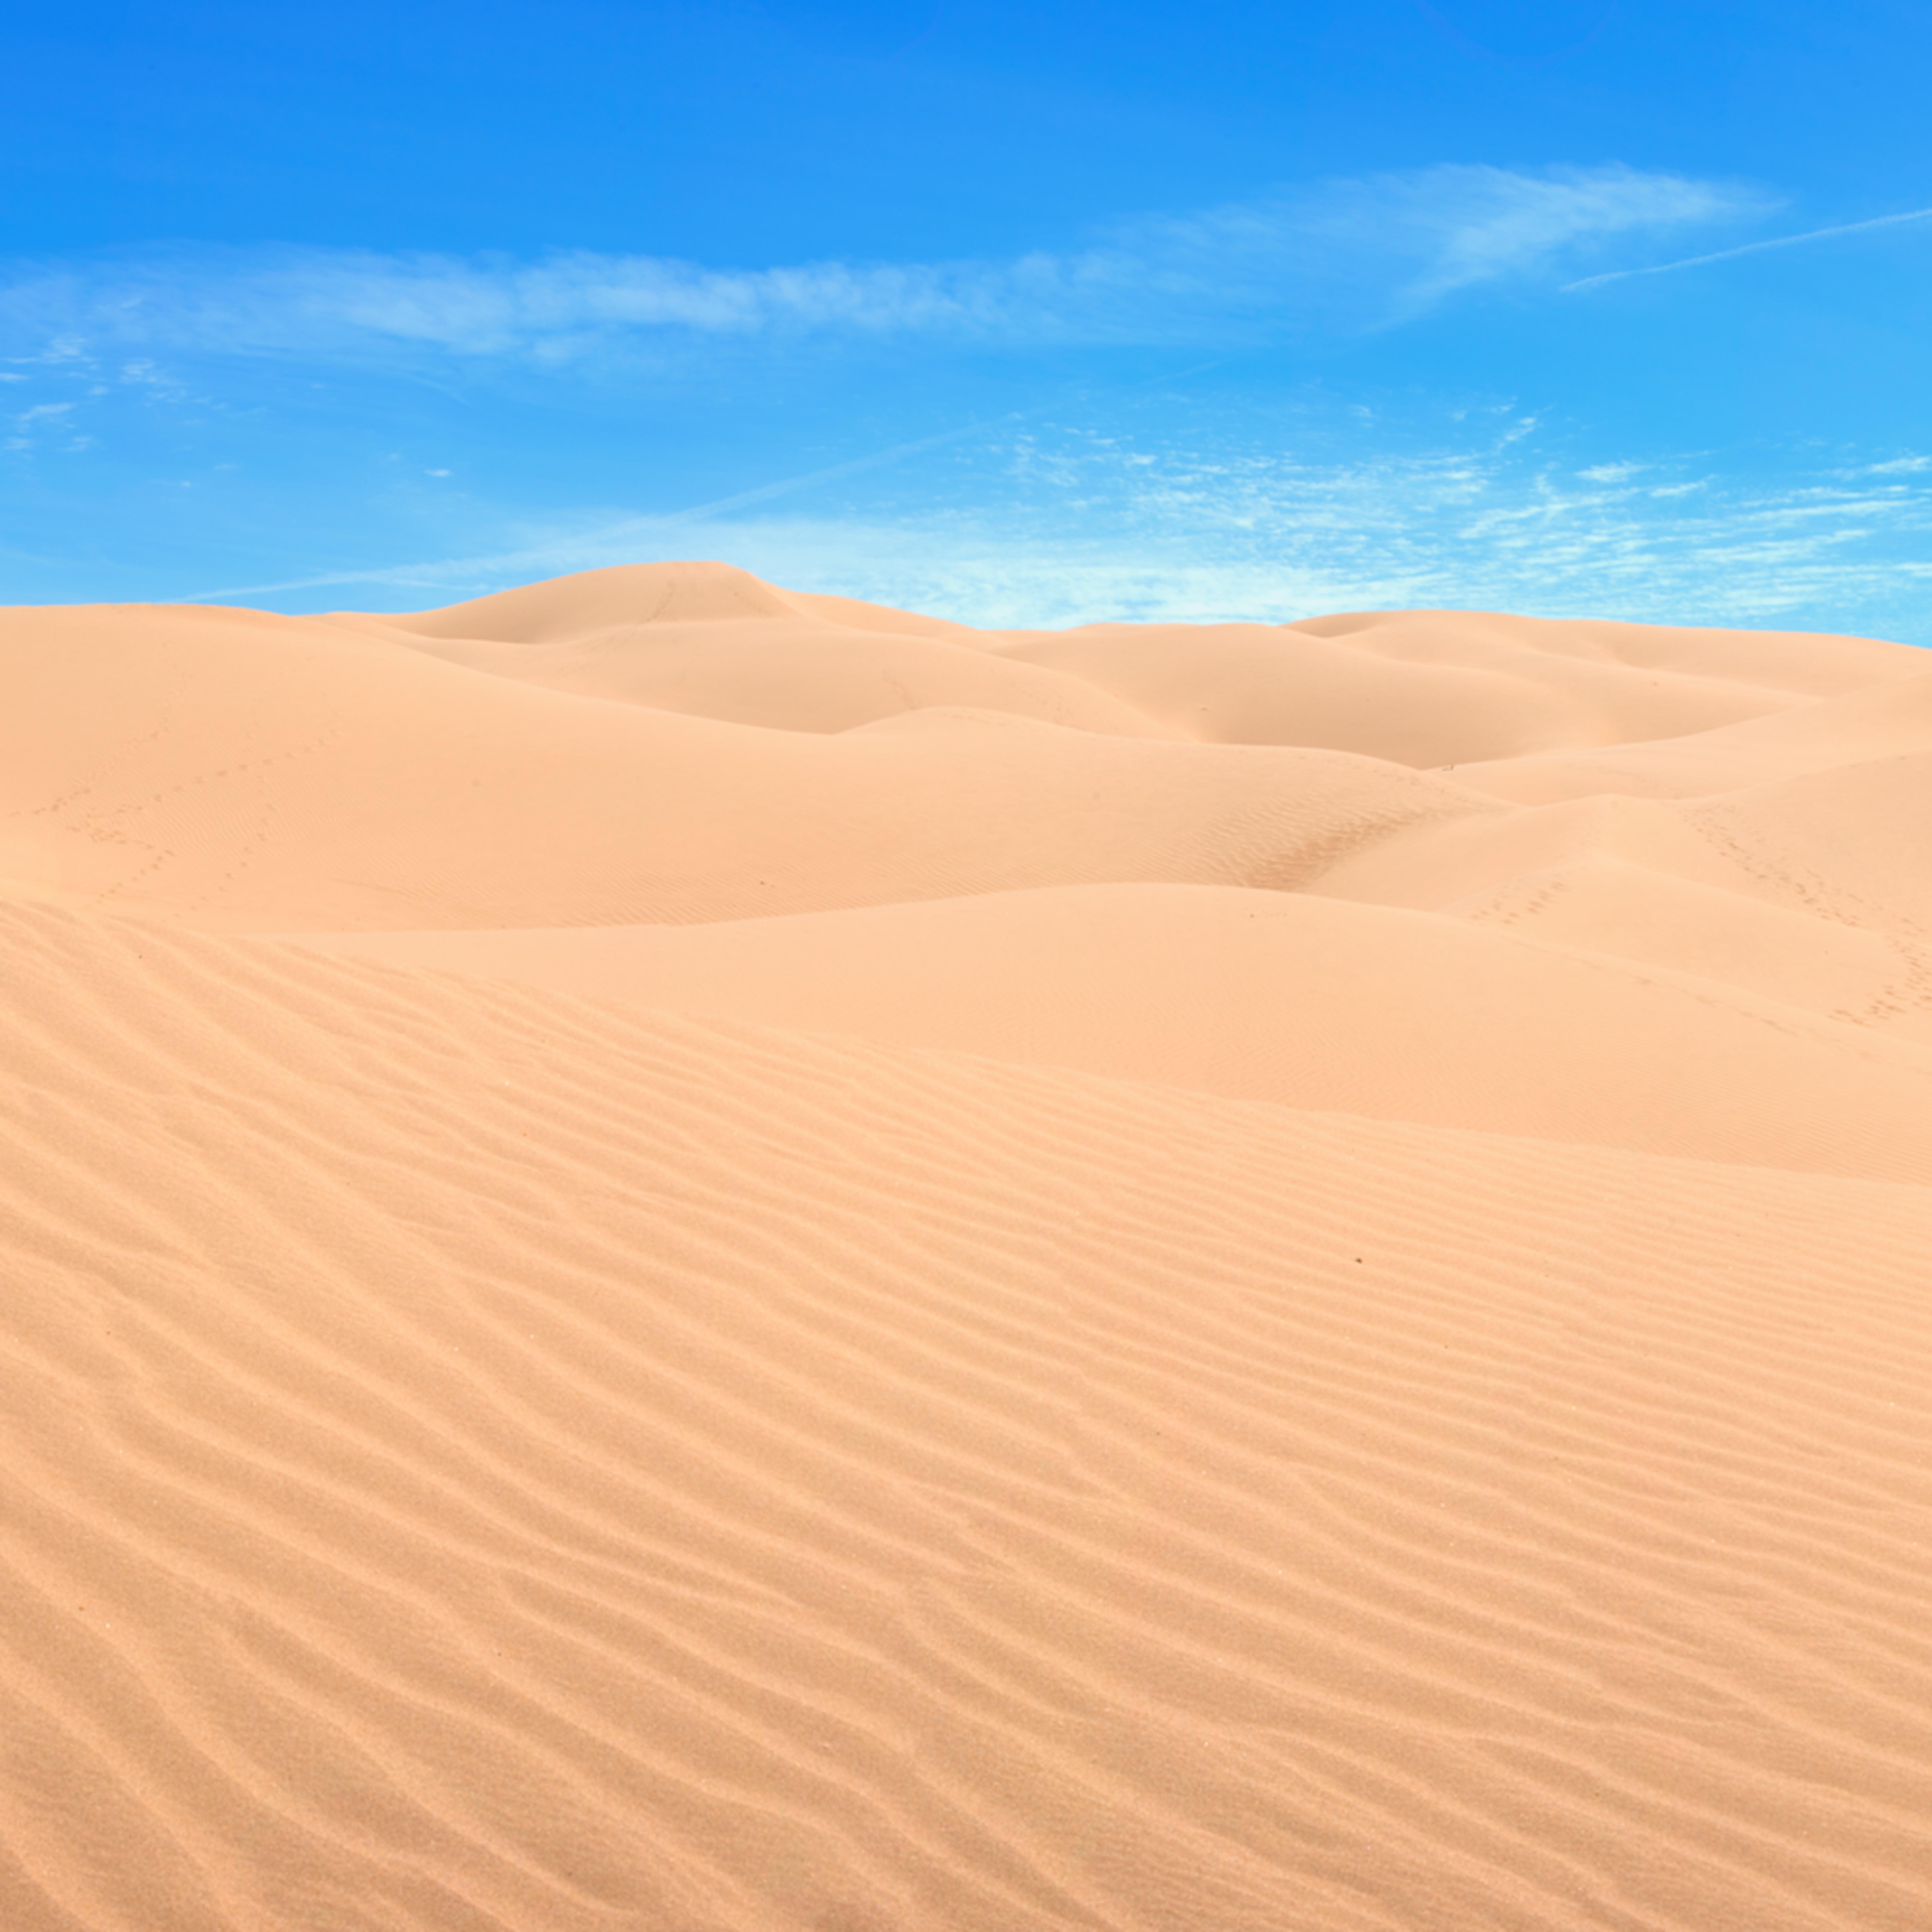 Imperial sand dunes pano izlf9v